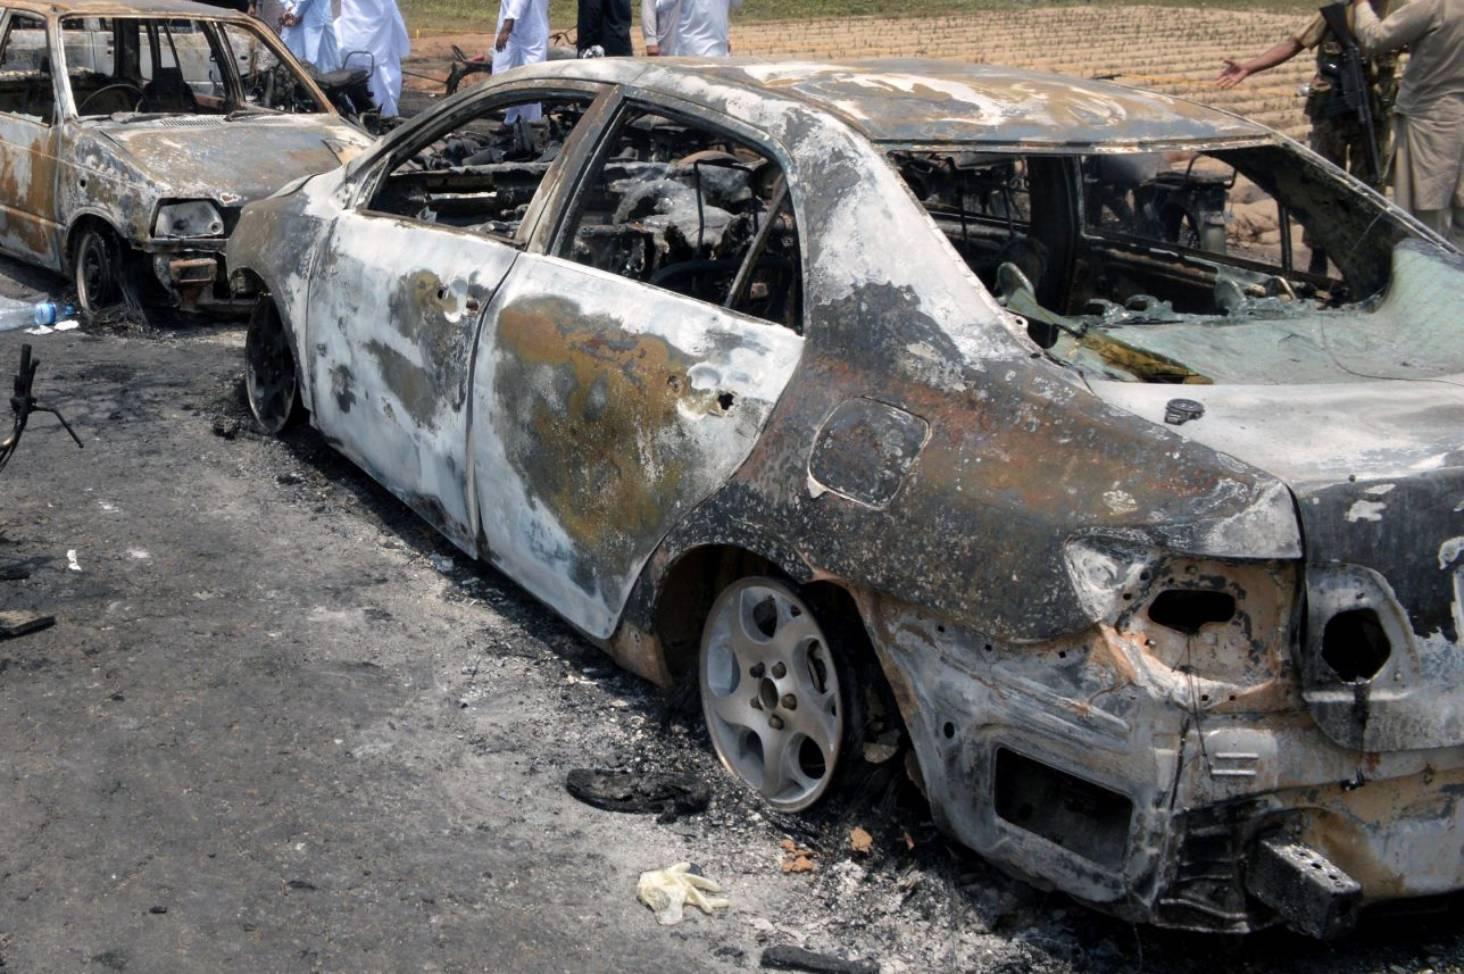 Overturned oil tanker explodes, killing 153 in Pakistan | Stuff co nz